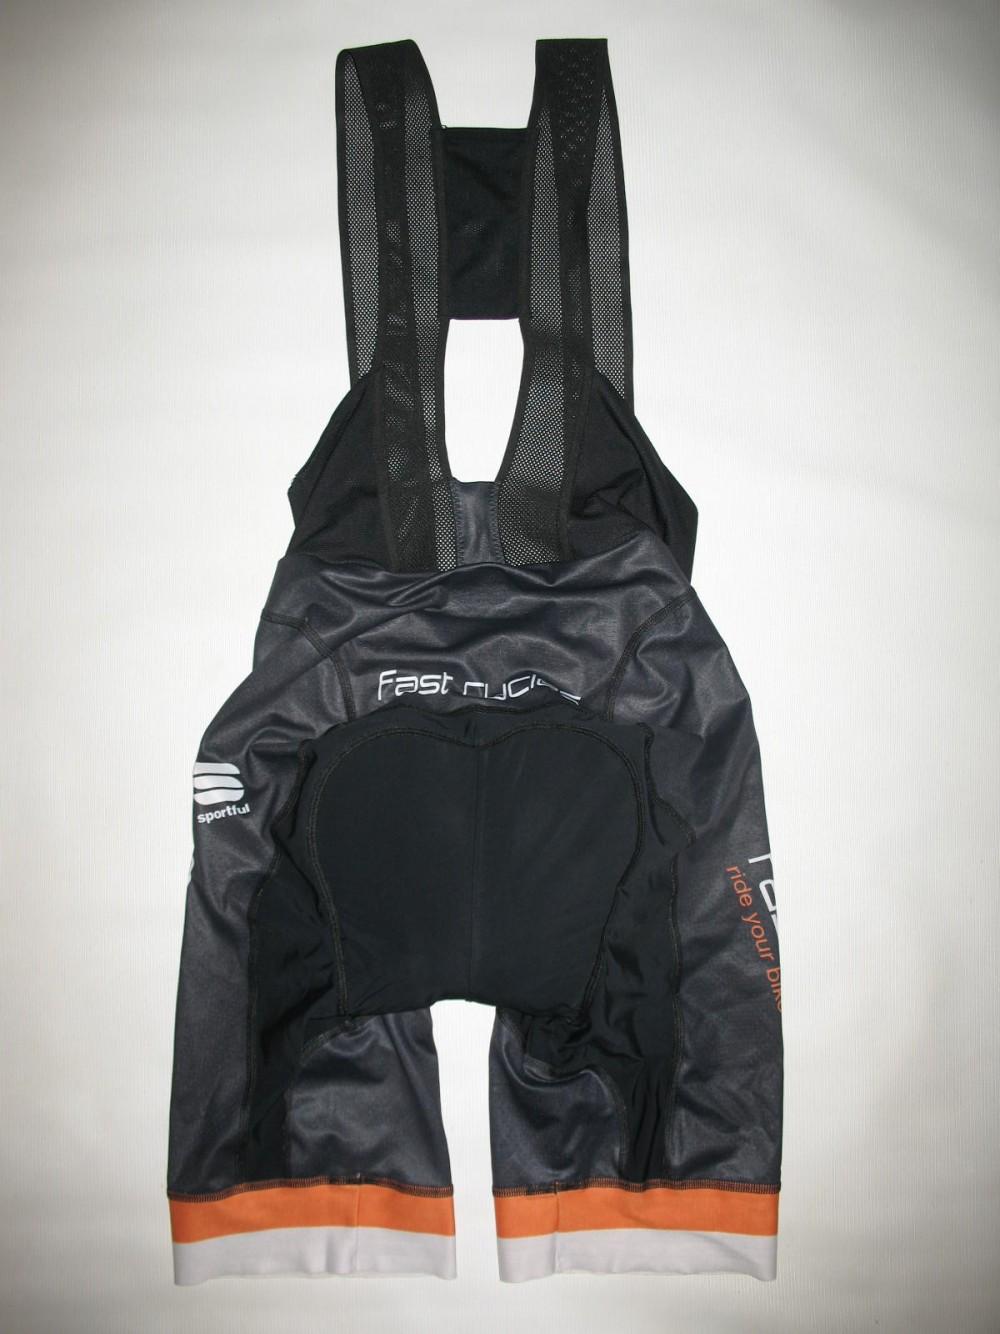 Велошорты SPORTFUL fast cycles bib shorts (размер L) - 3